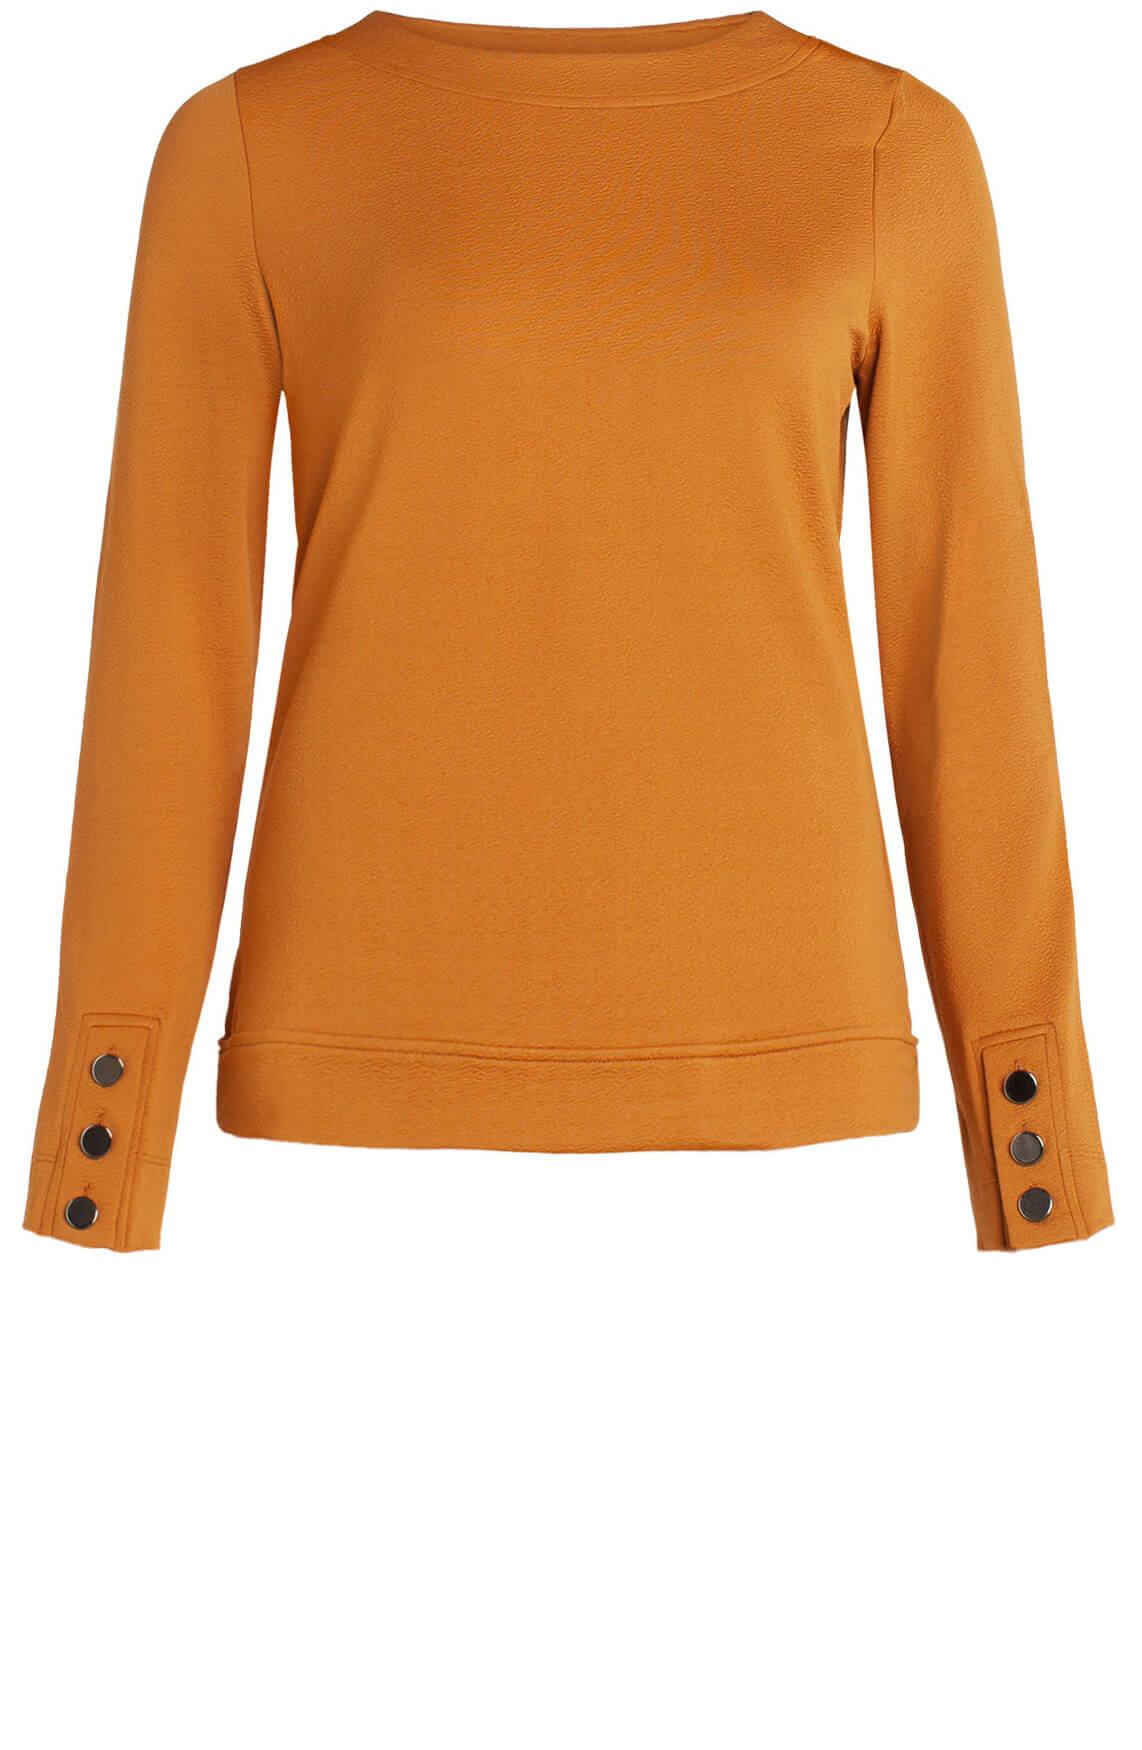 Anna Dames Sweater Oranje